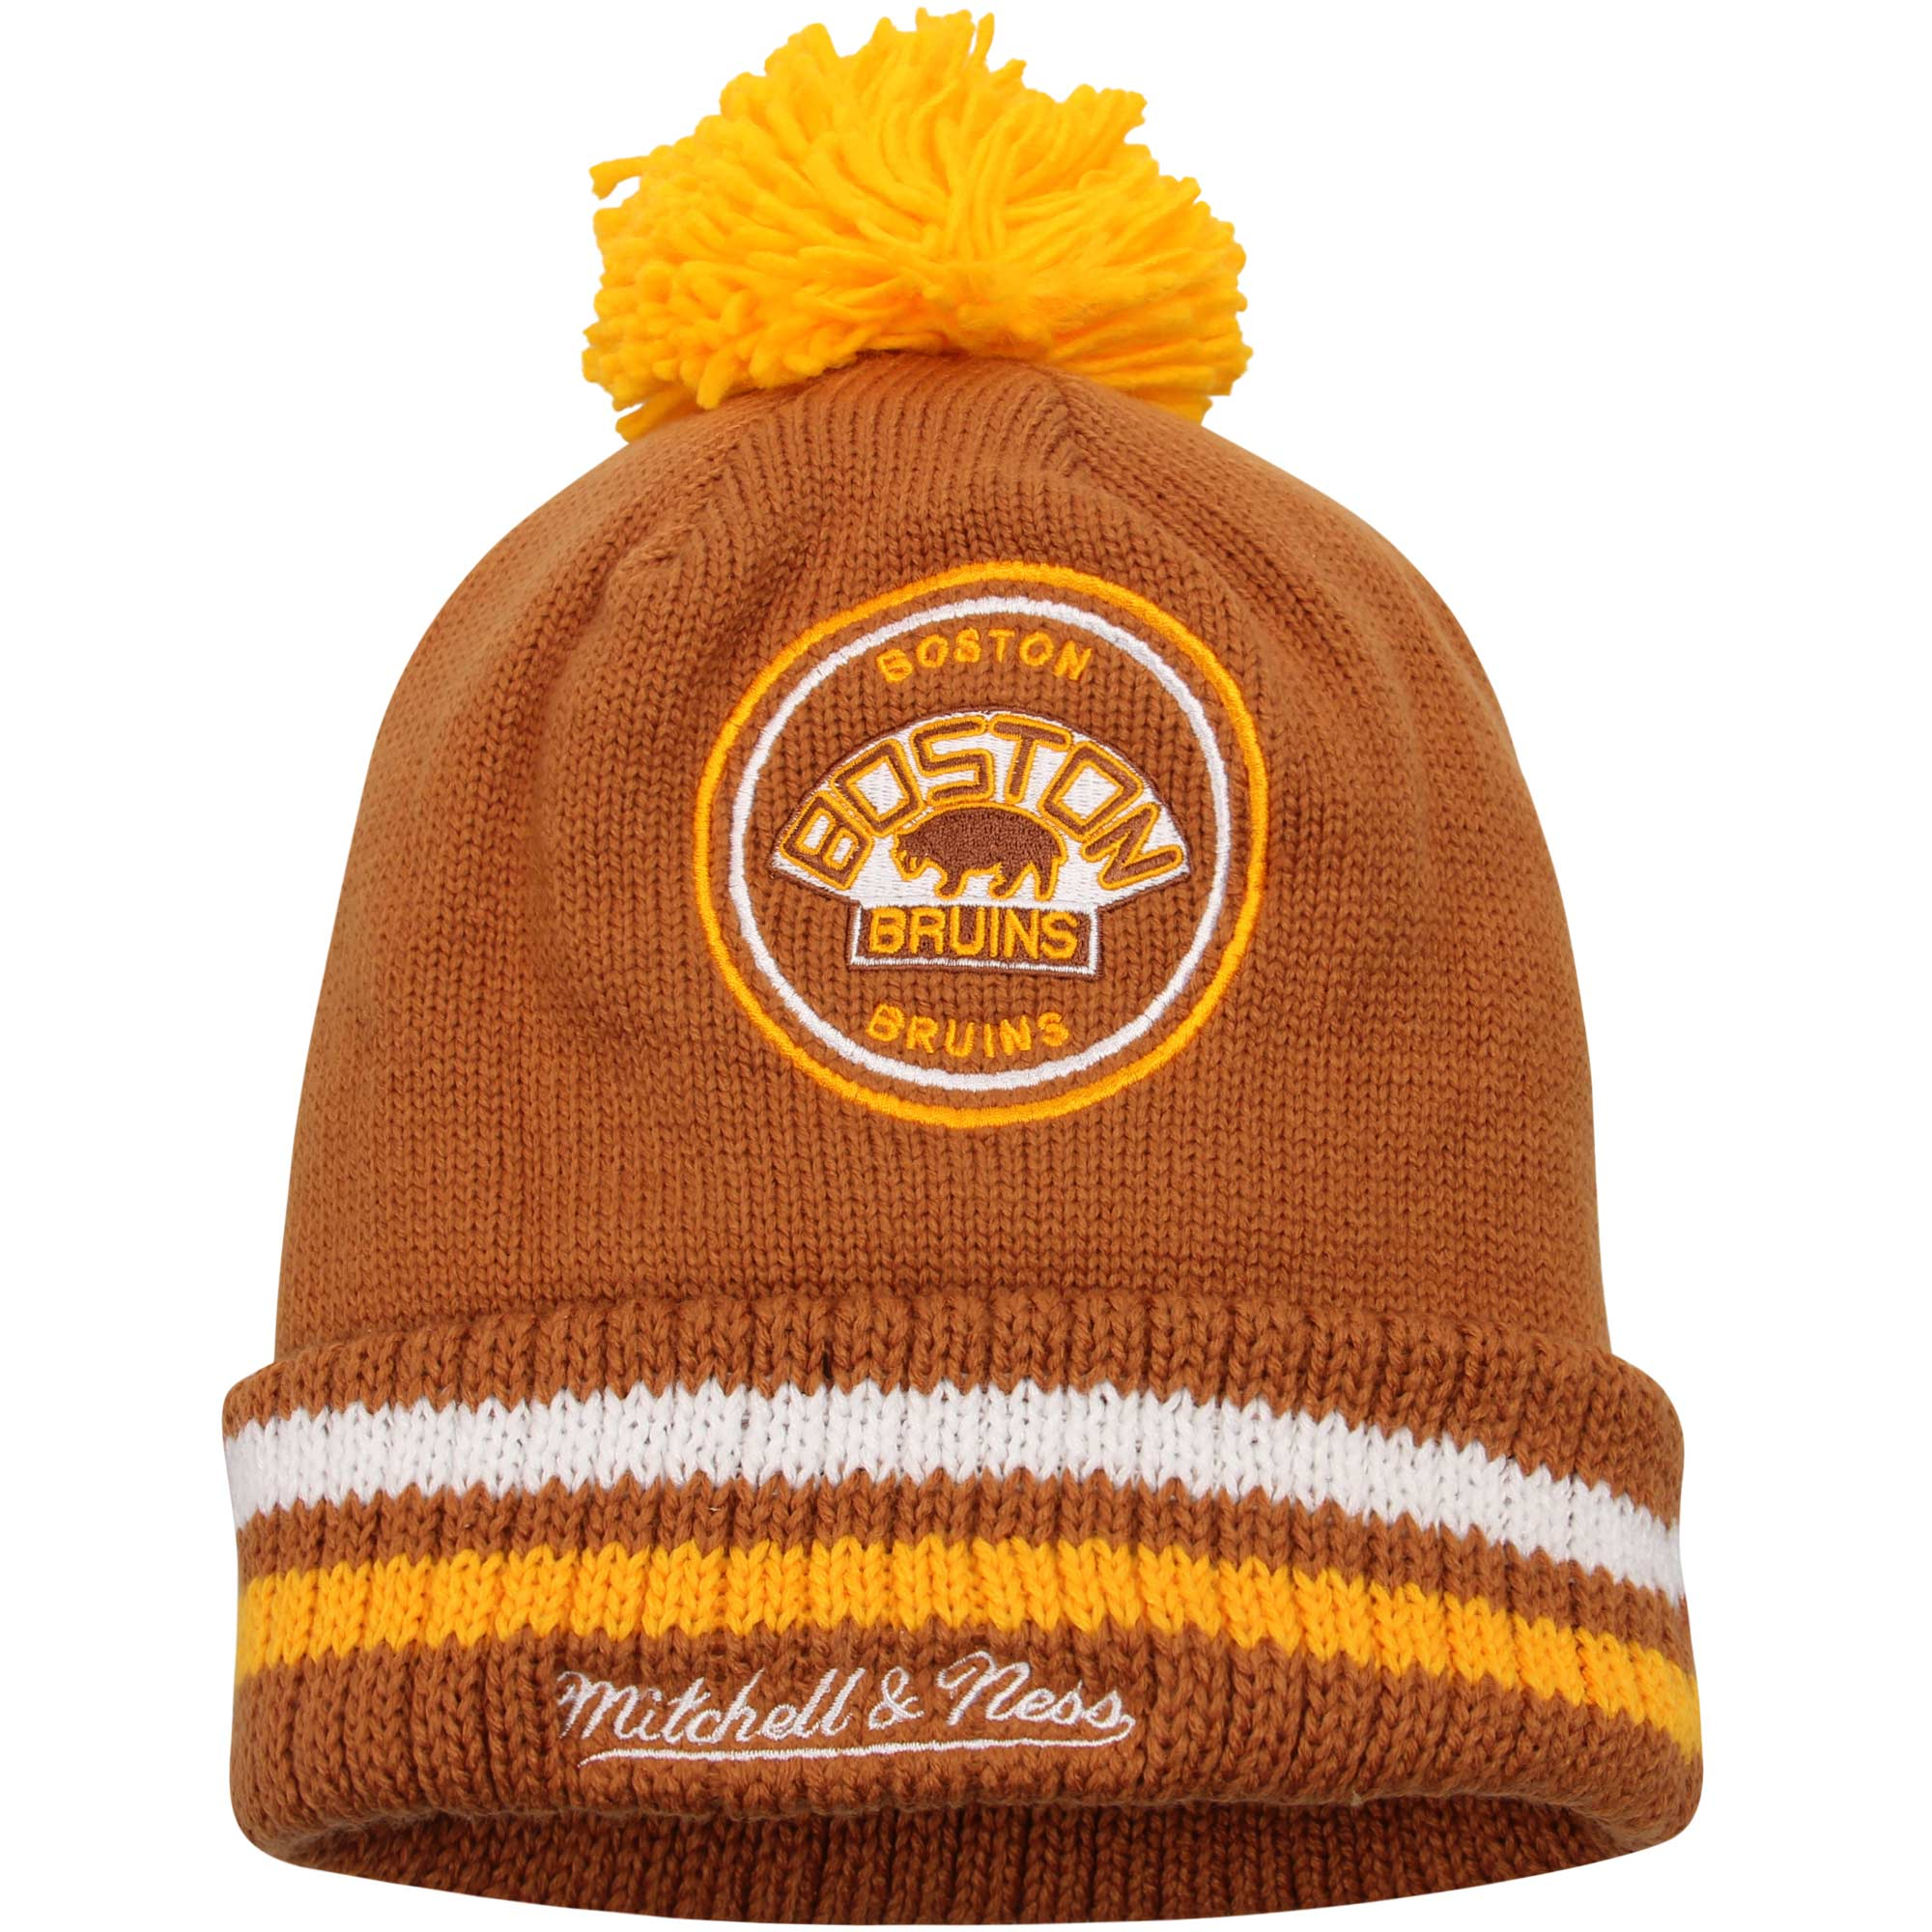 Boston Bruins Mitchell & Ness Vintage Big Man Hi-Five Cuffed Knit Hat Brown OSFA by MITCHELL NESS CO.